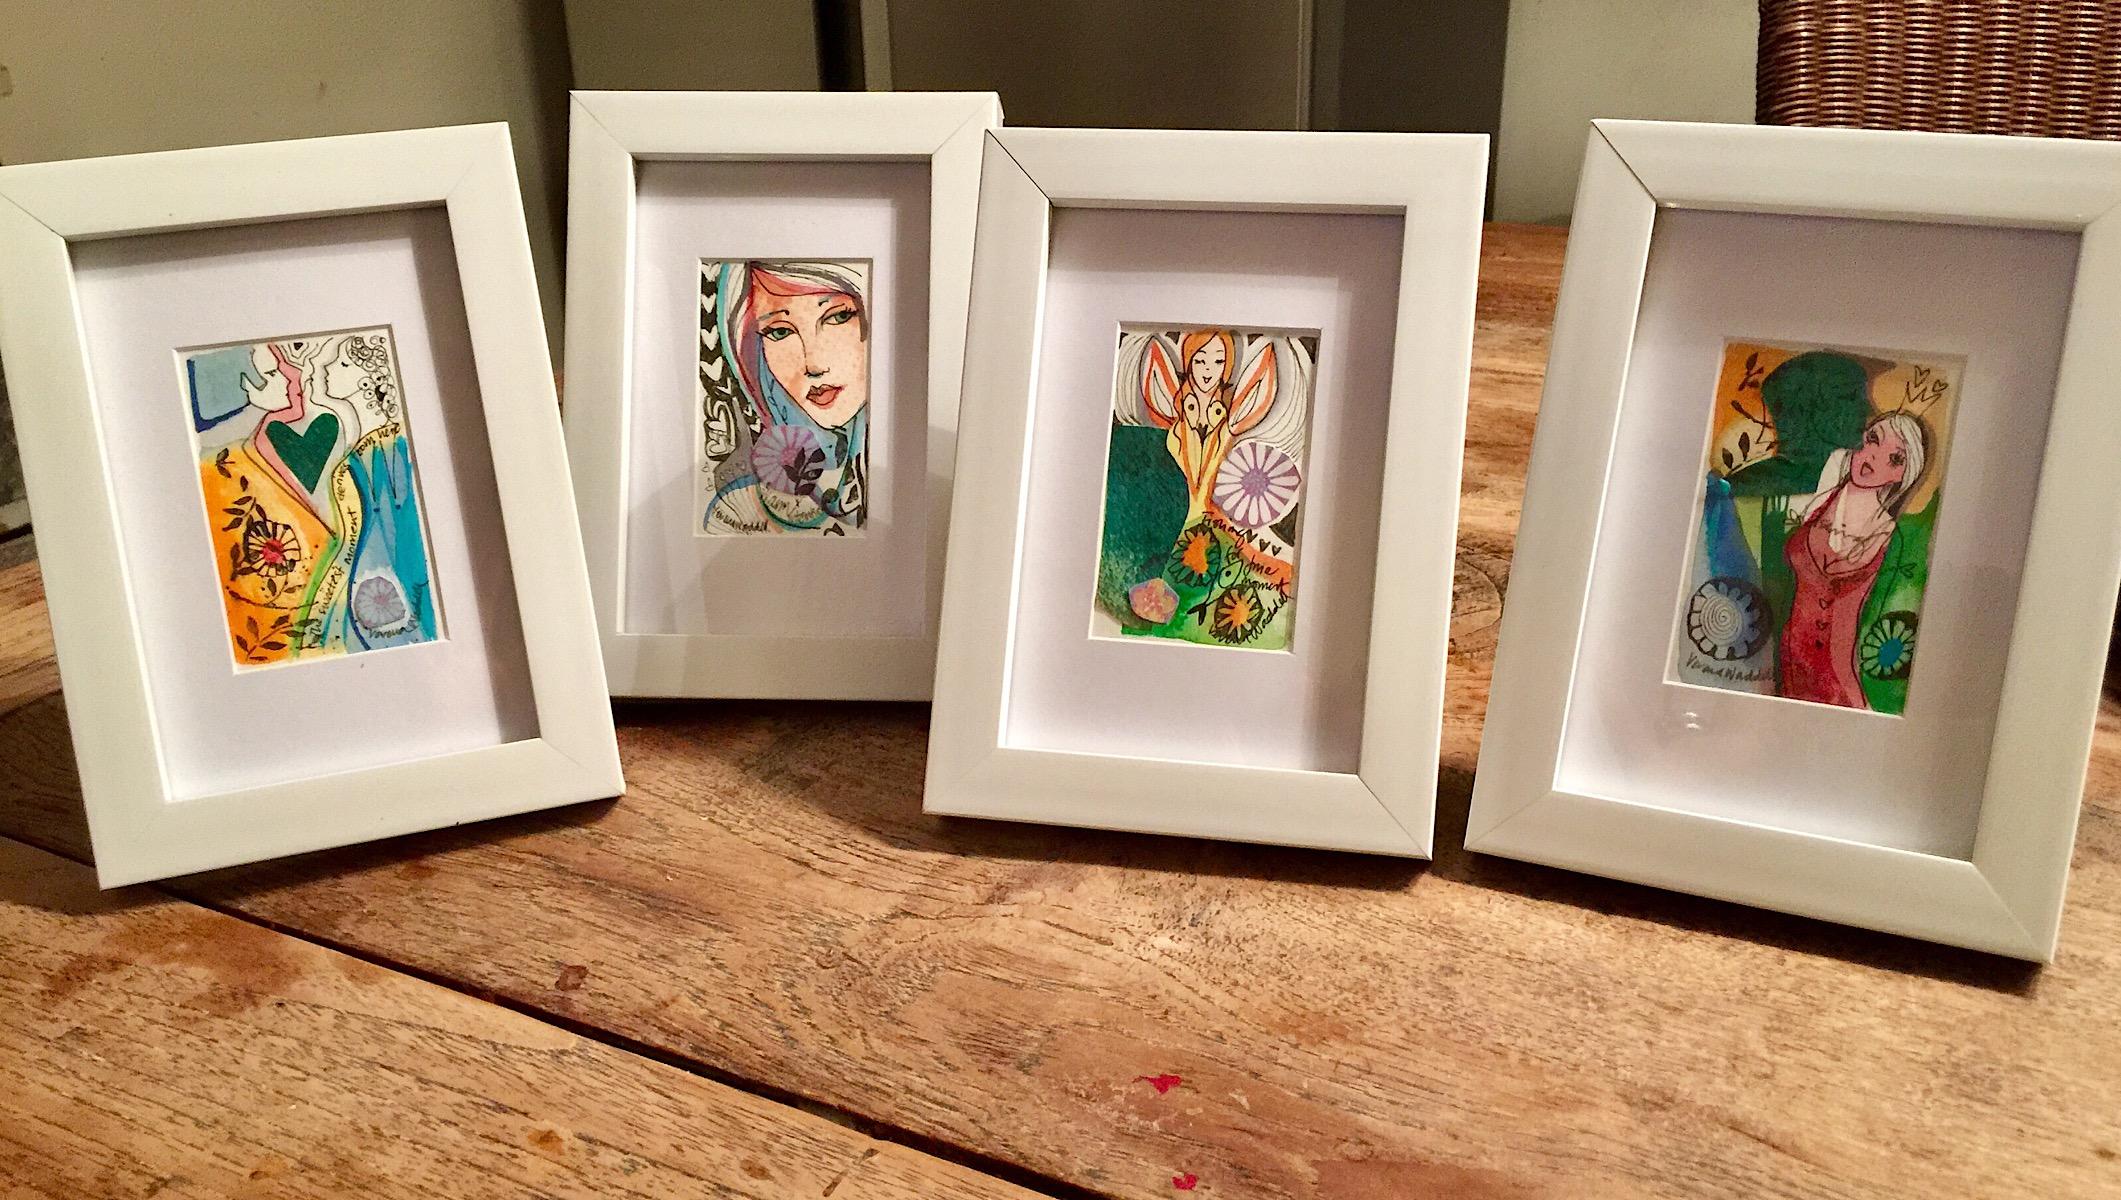 Verena Waddell visual artist original ink blekk gift gave